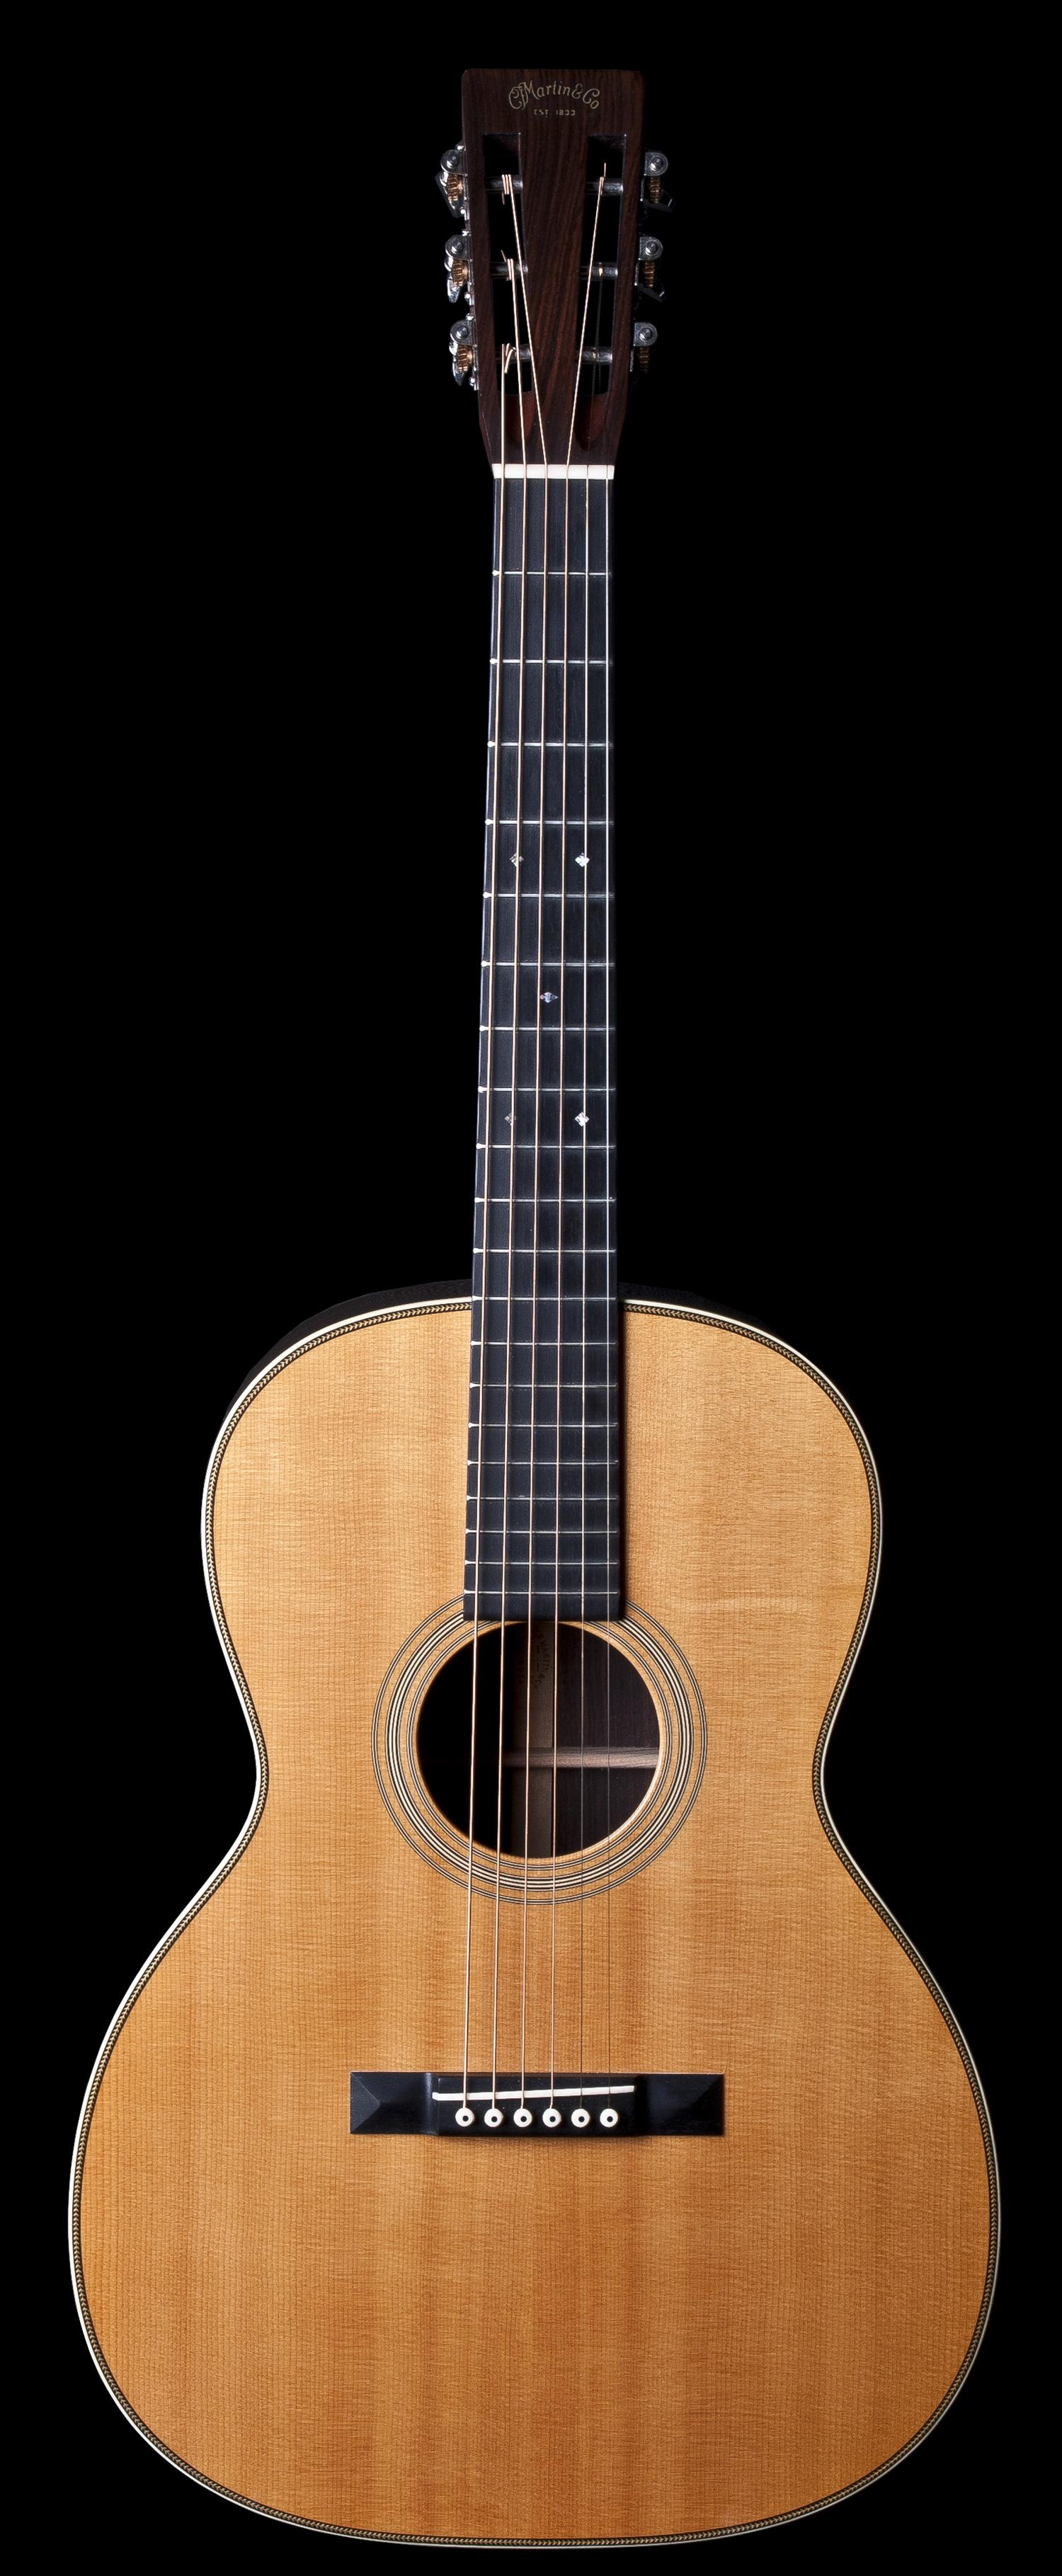 used martin 00028vs acoustic guitar with case ebay. Black Bedroom Furniture Sets. Home Design Ideas